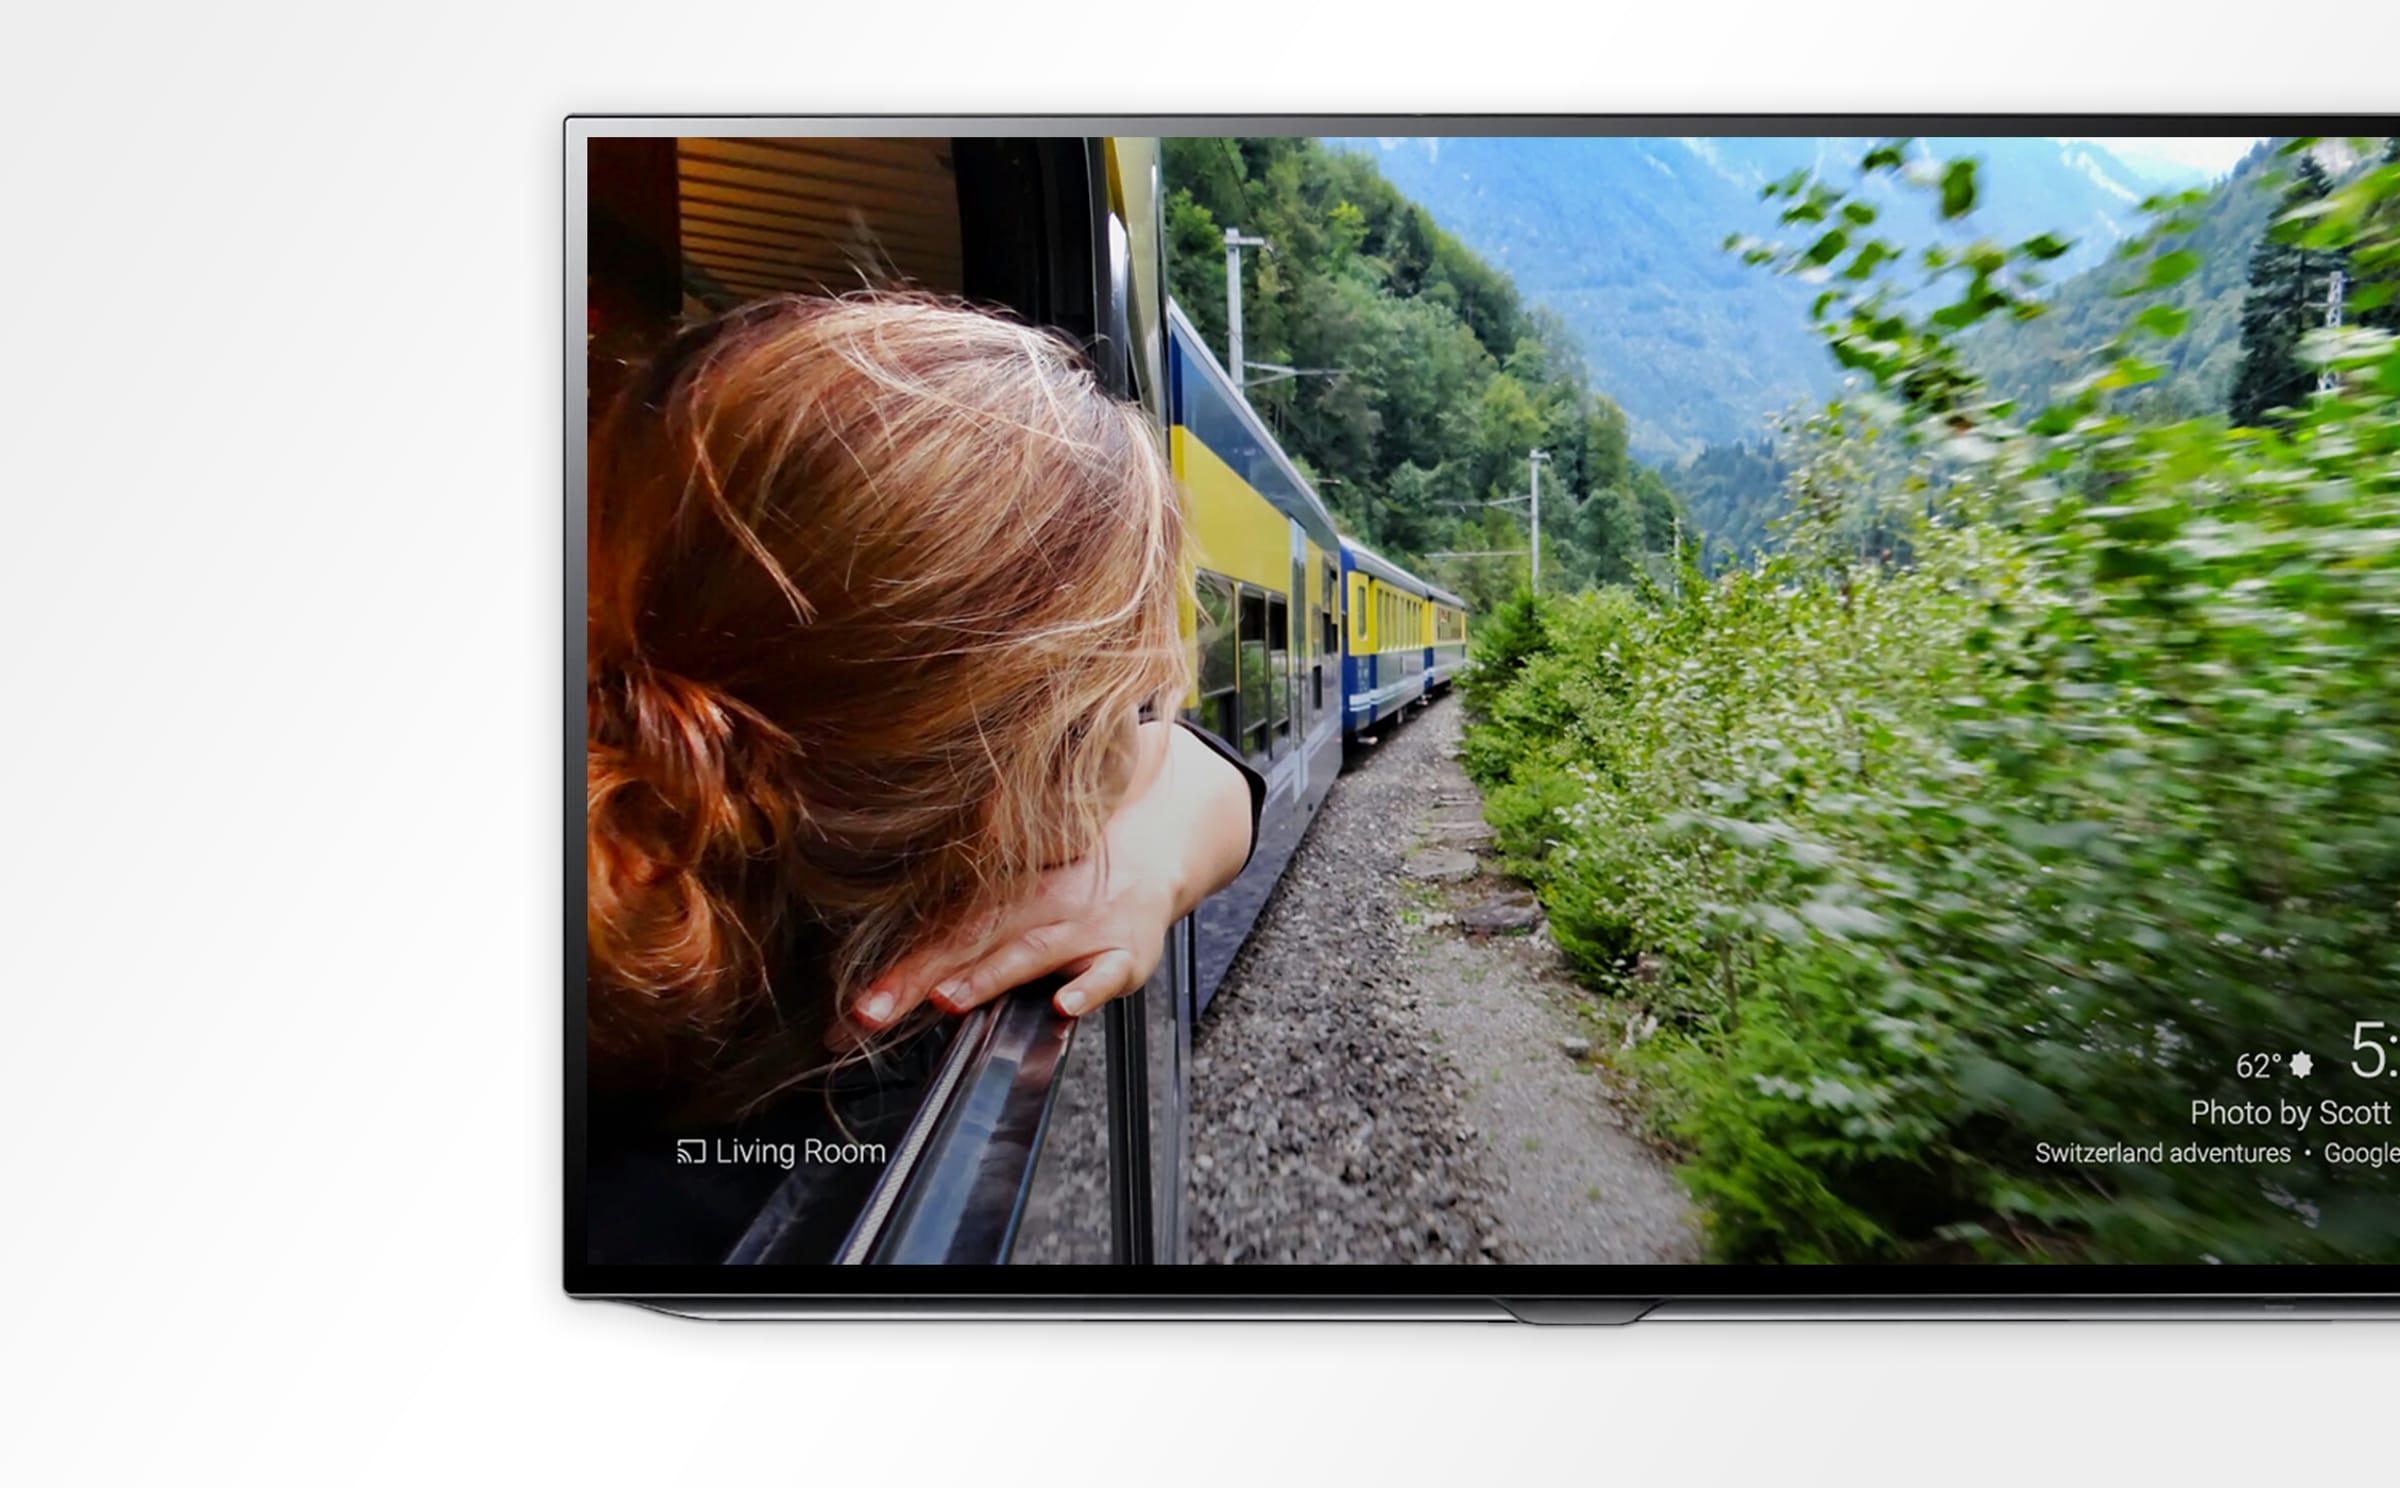 http://www.google.com.pk/chromecast/static/images/tv/smart-matrix-04-backdrop.jpg